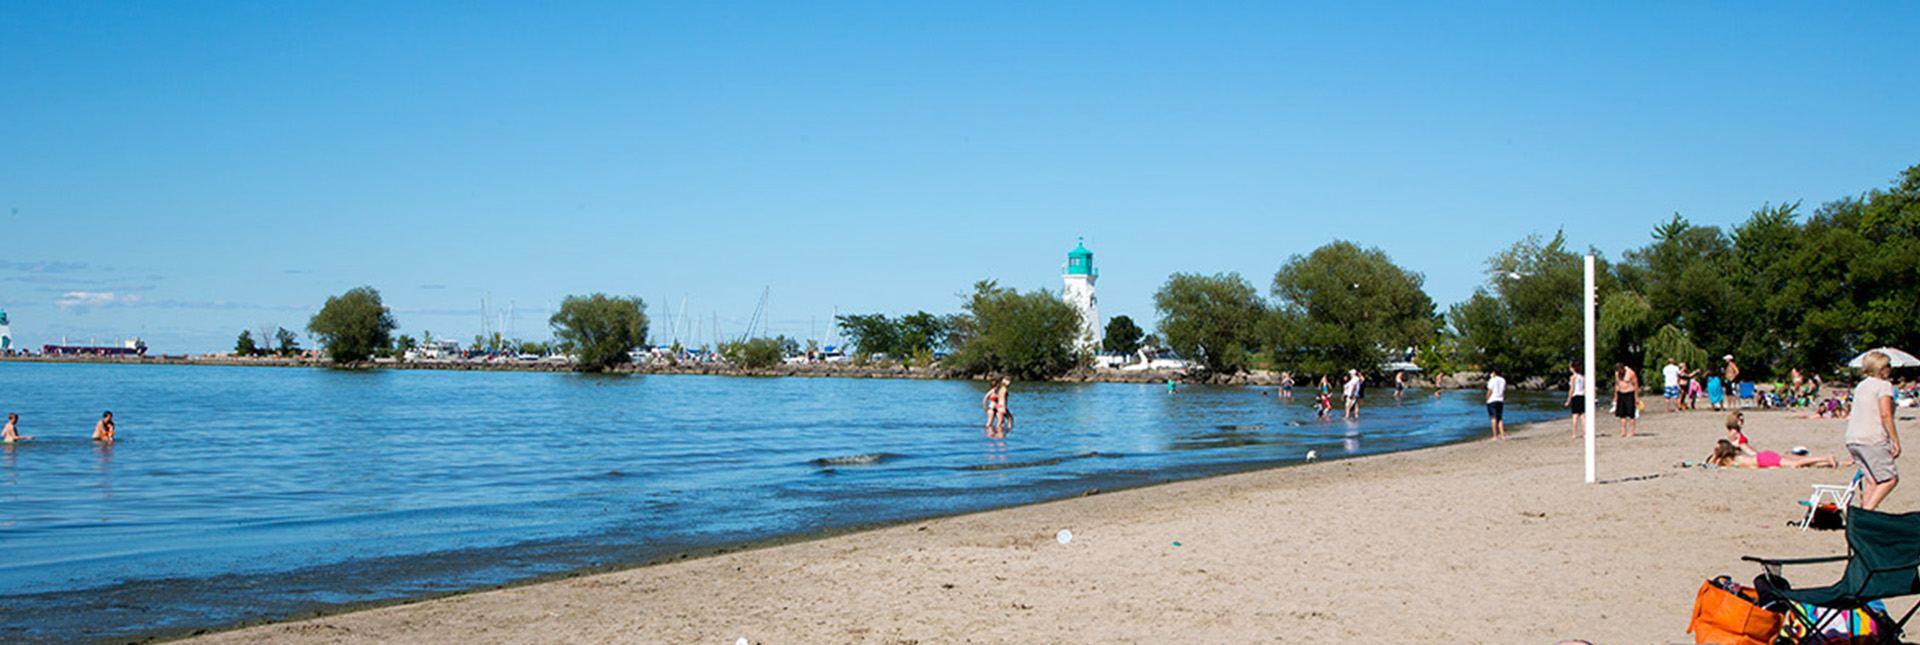 Lakeside Park Beach Visit Niagara Canada